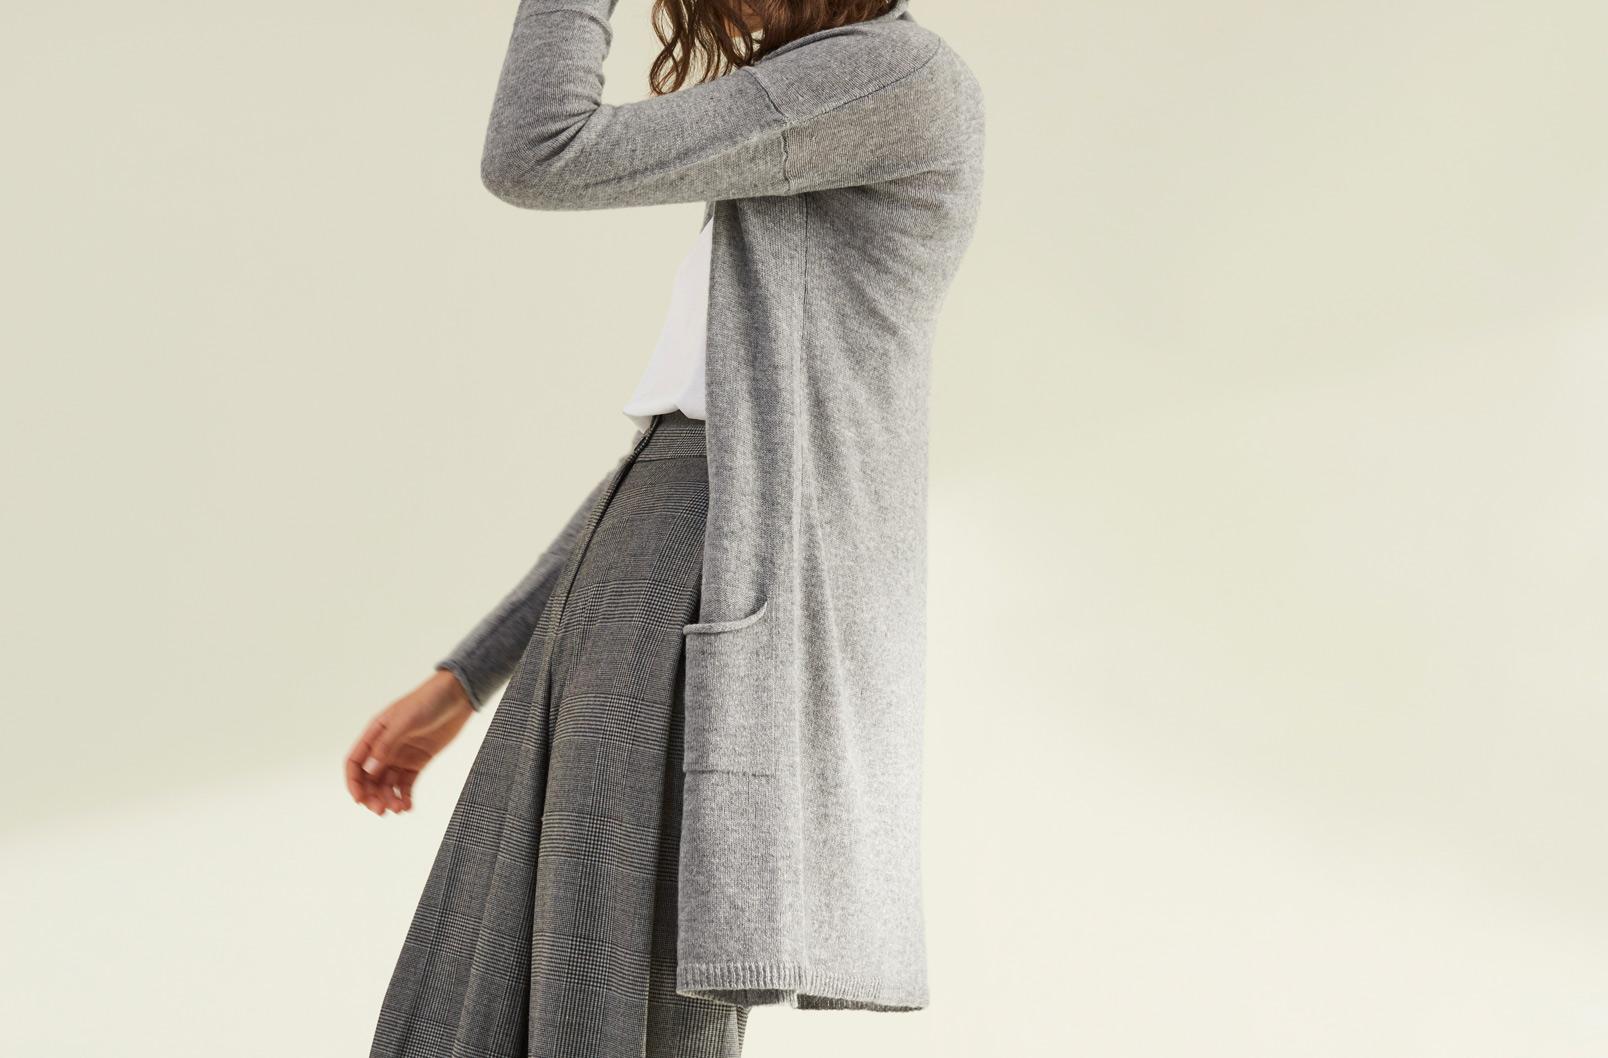 Model wearing Cuyana Open Cashmere Cardigan